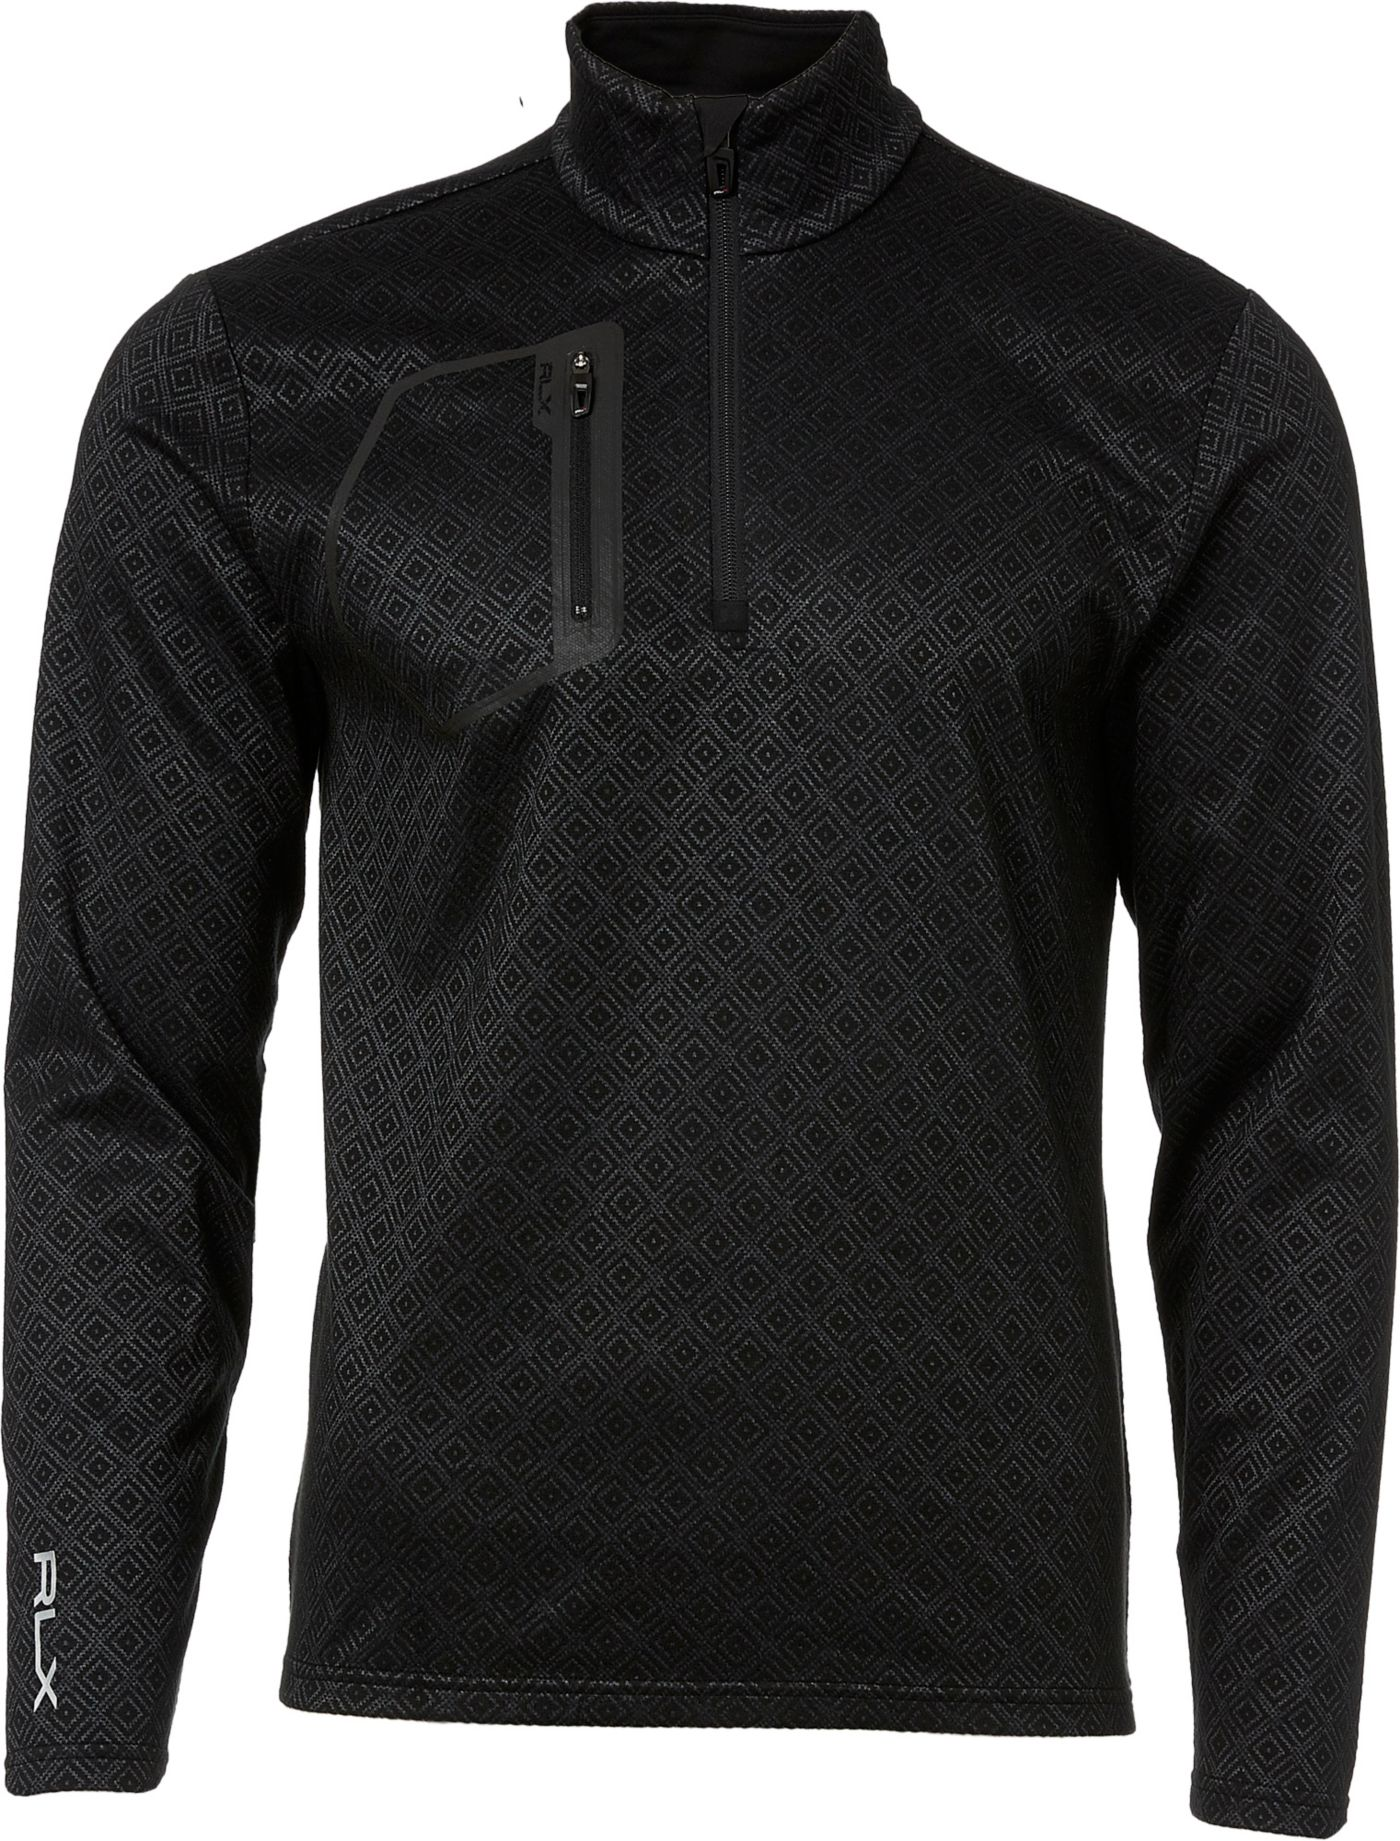 RLX Golf Men's Brushed Jersey Golf ¼ Zip